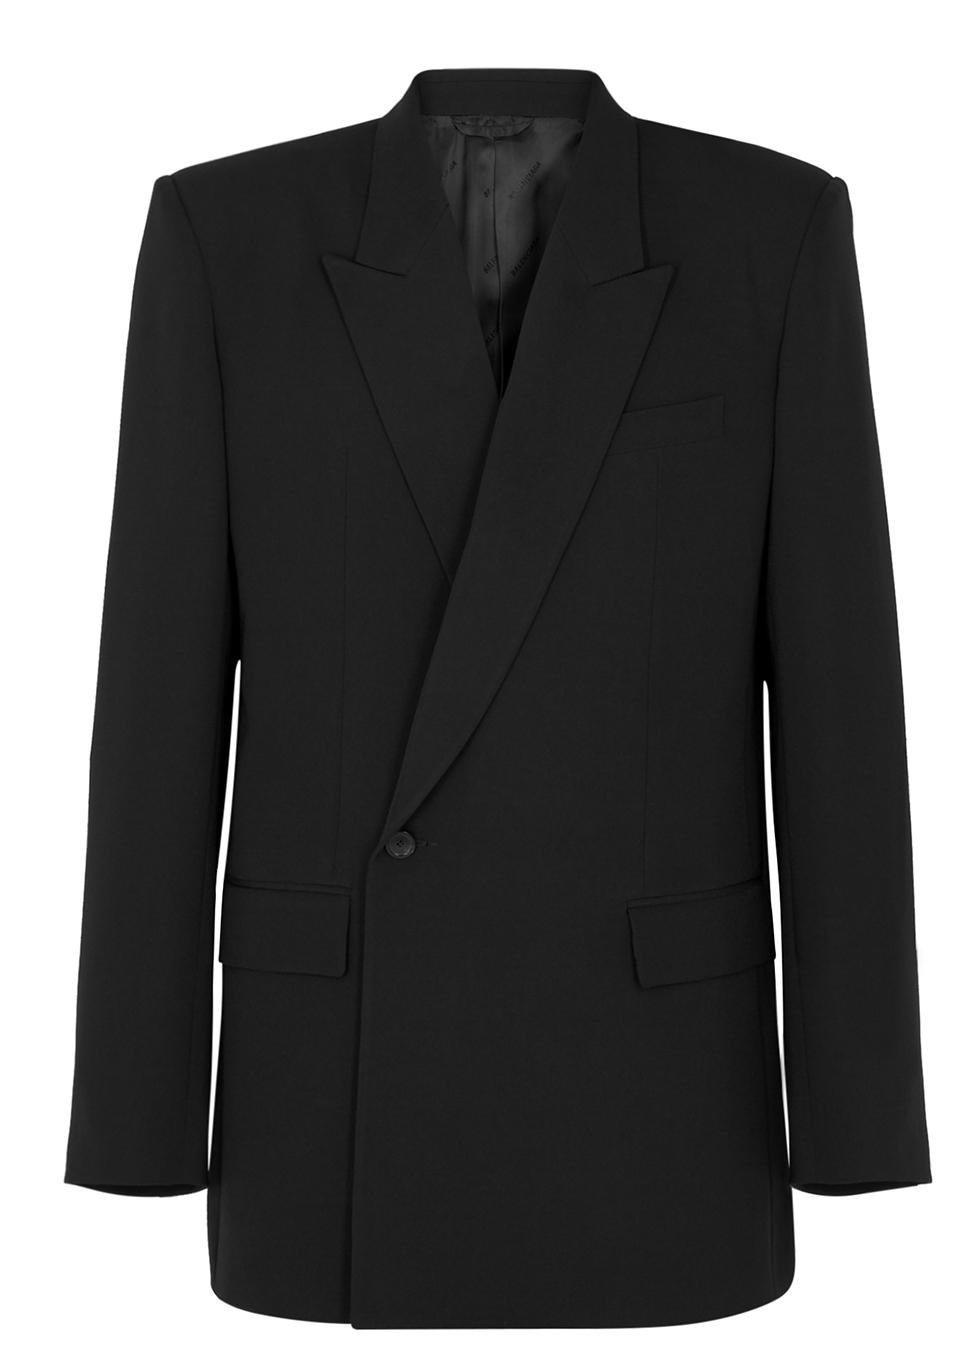 Black oversized twill blazer - Balenciaga